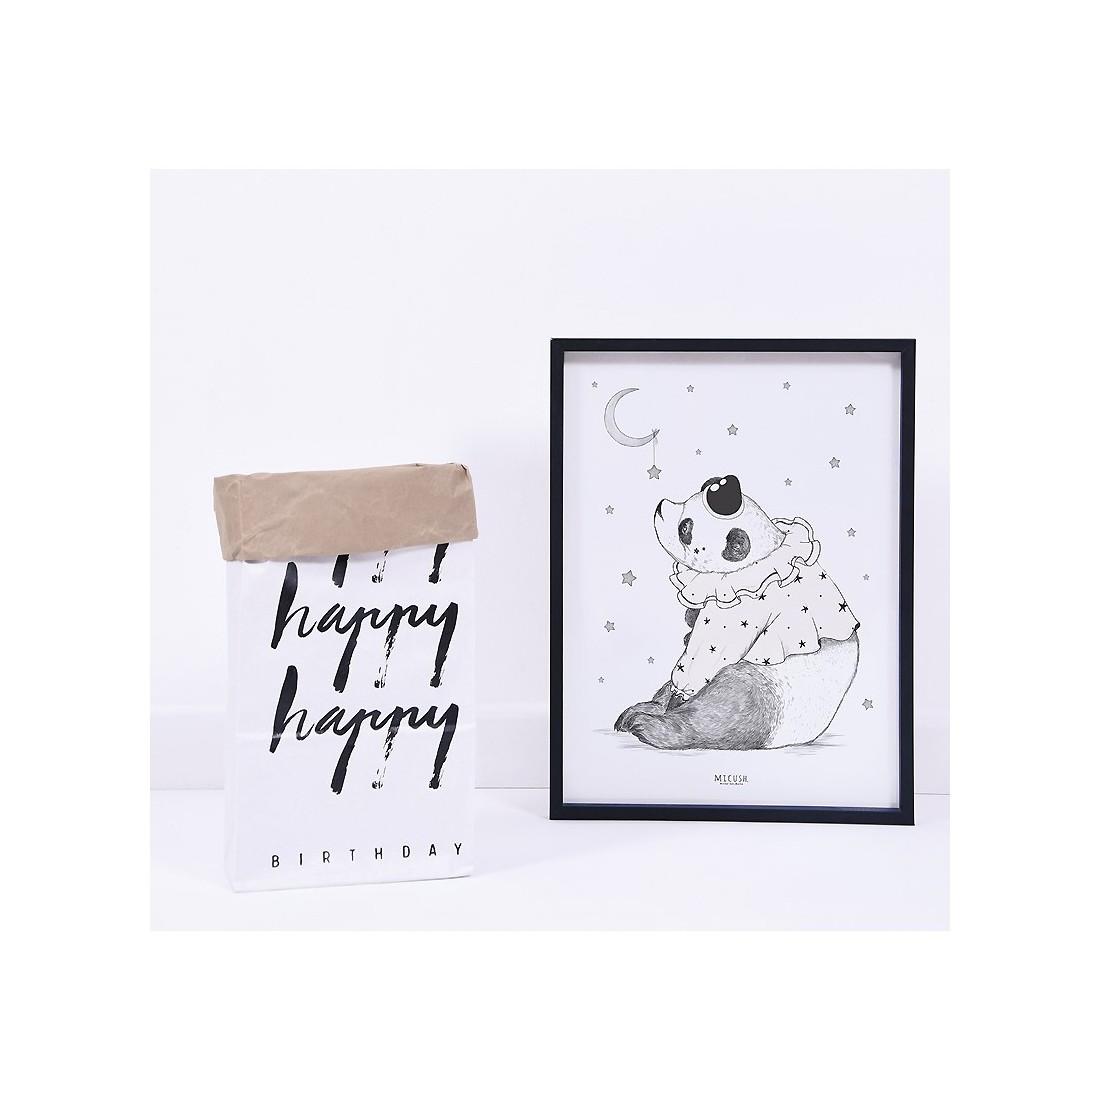 Tableau Enfant Affiche Encadr E Panda Lilipinso Ma Chambramoi